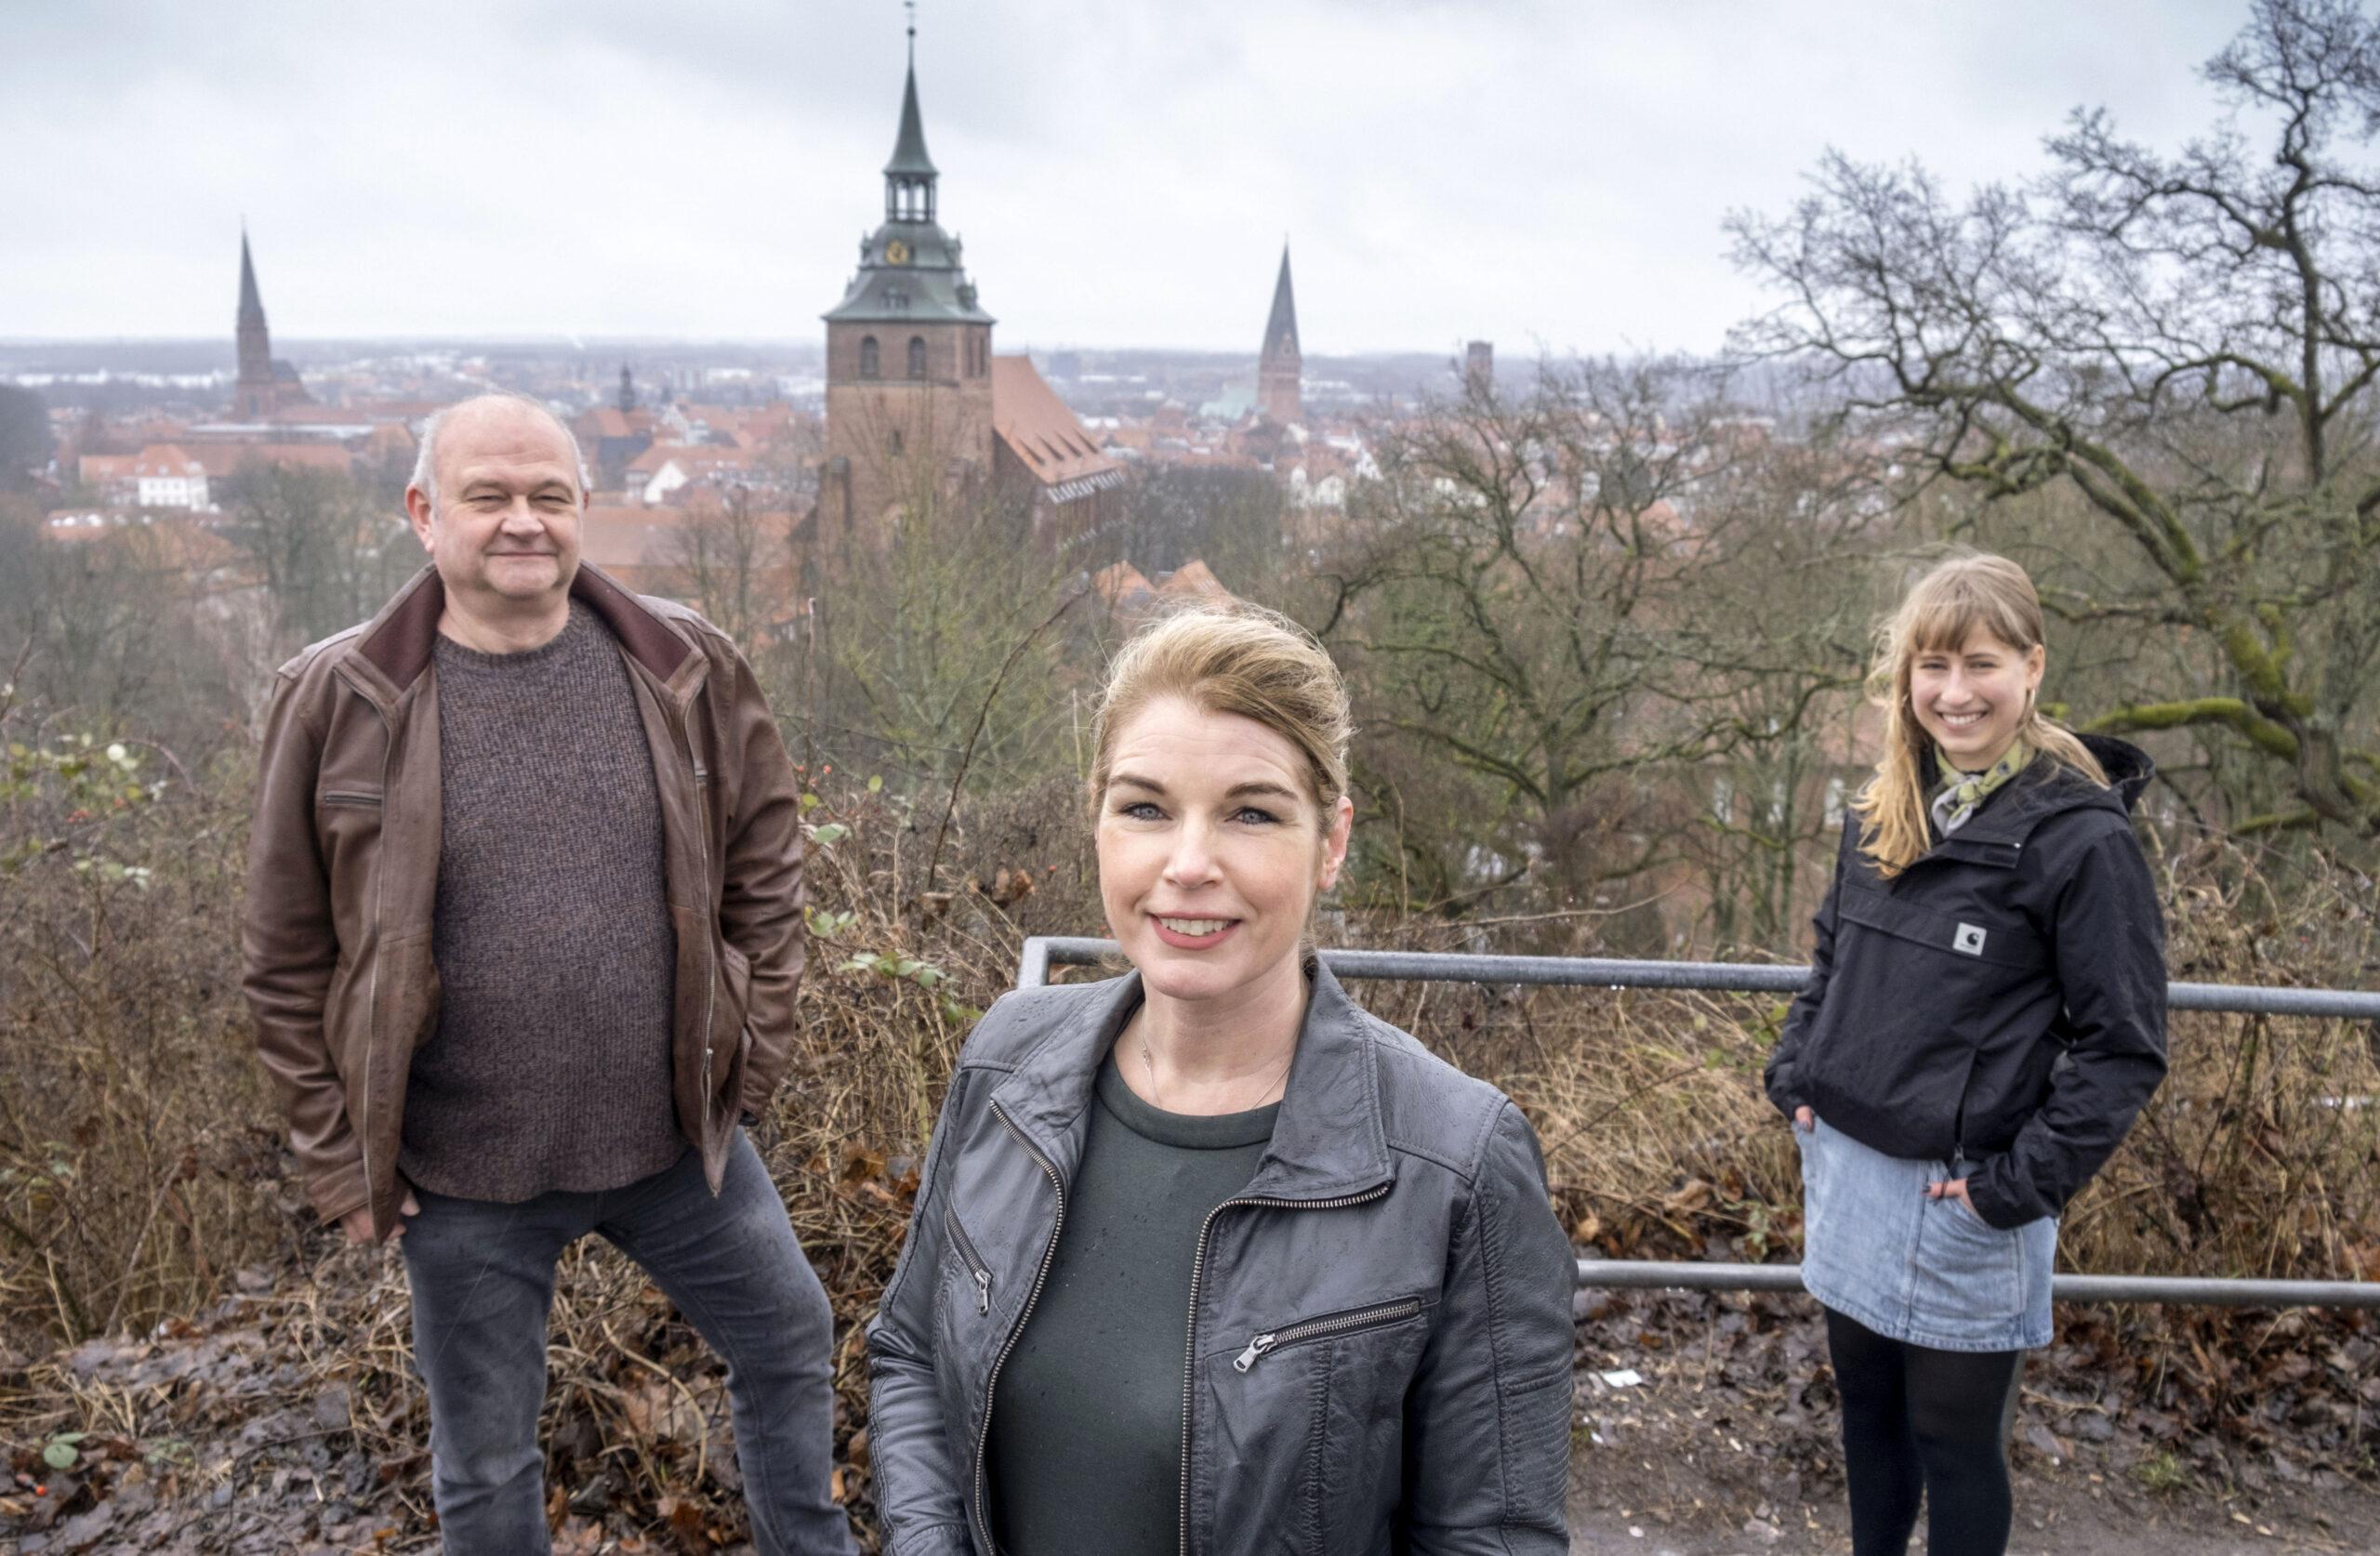 Vorstand nominiert Claudia Kalisch